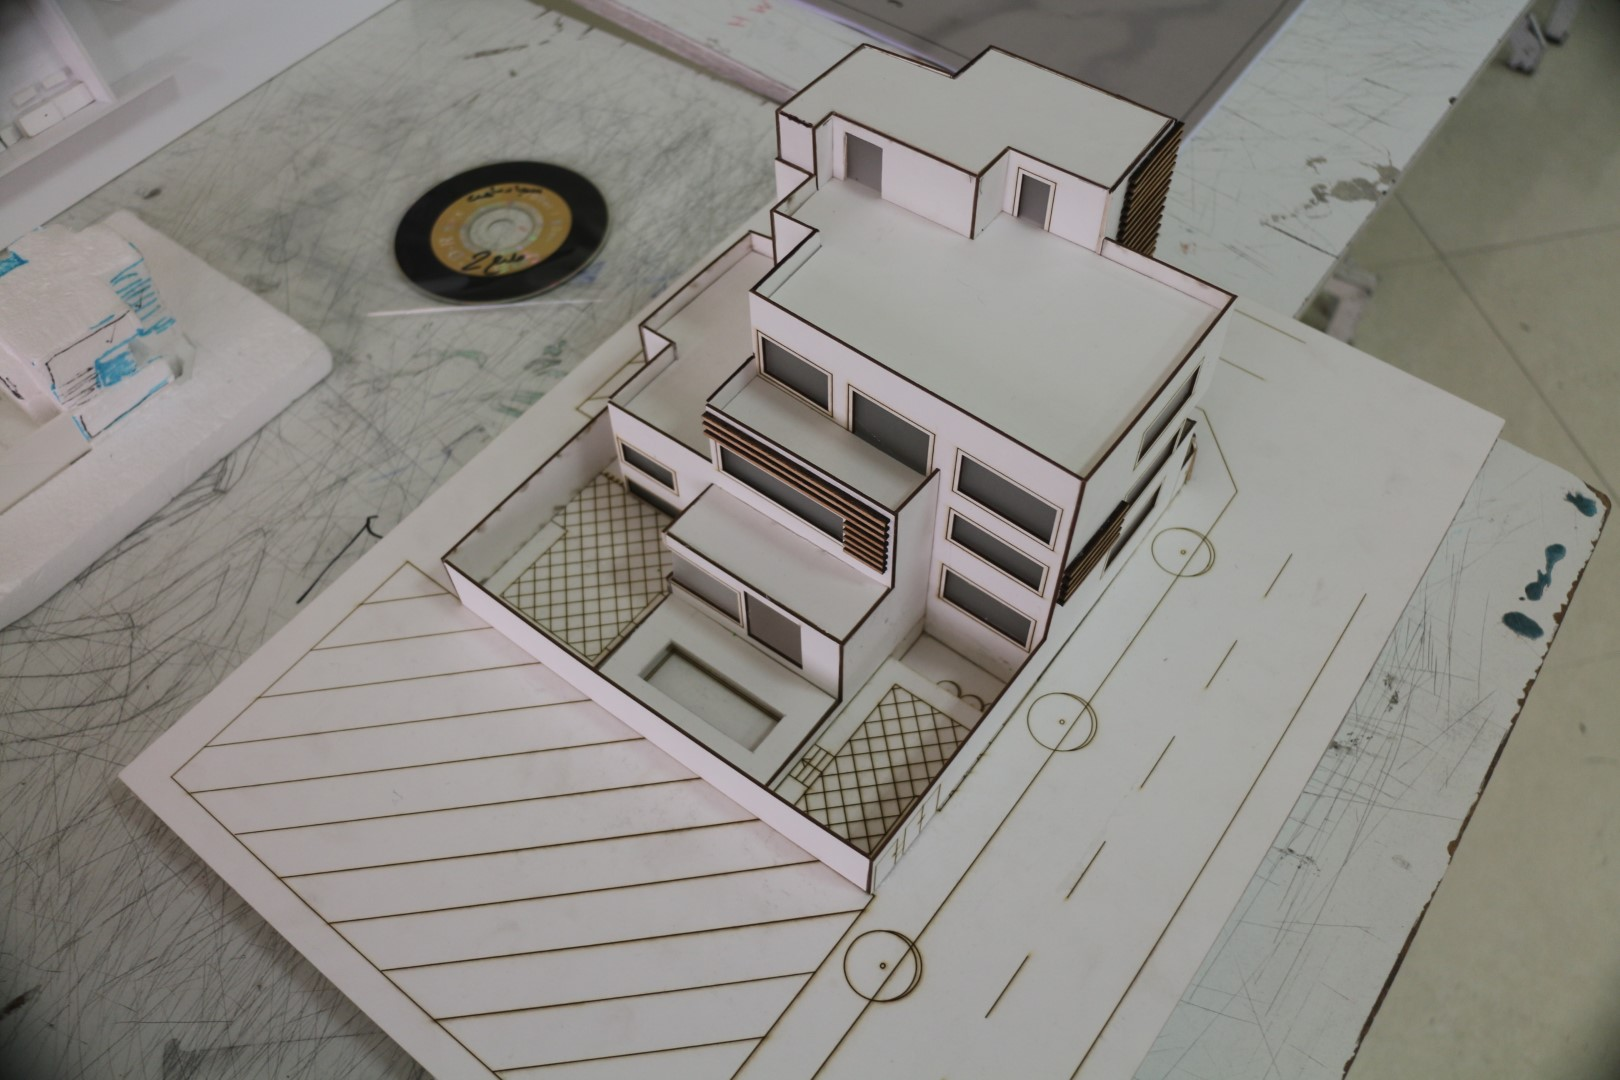 طرح دو معماری مسکونی